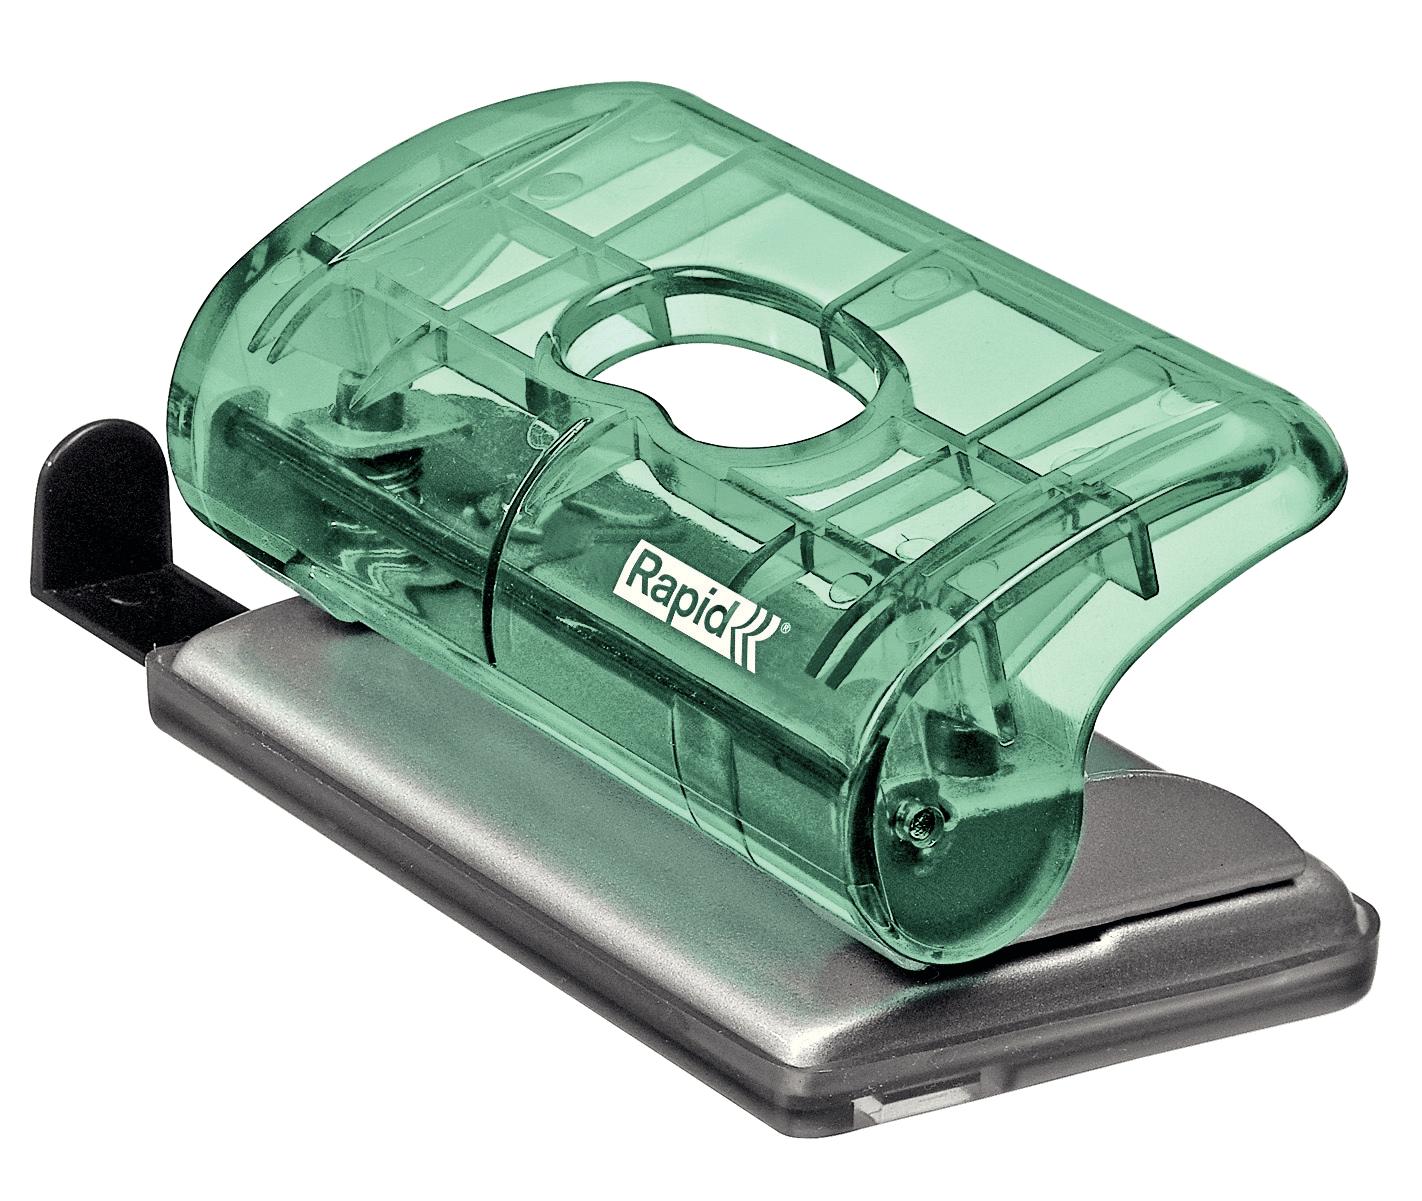 Hullemaskin Rapid Colour'Ice trans grønn BL